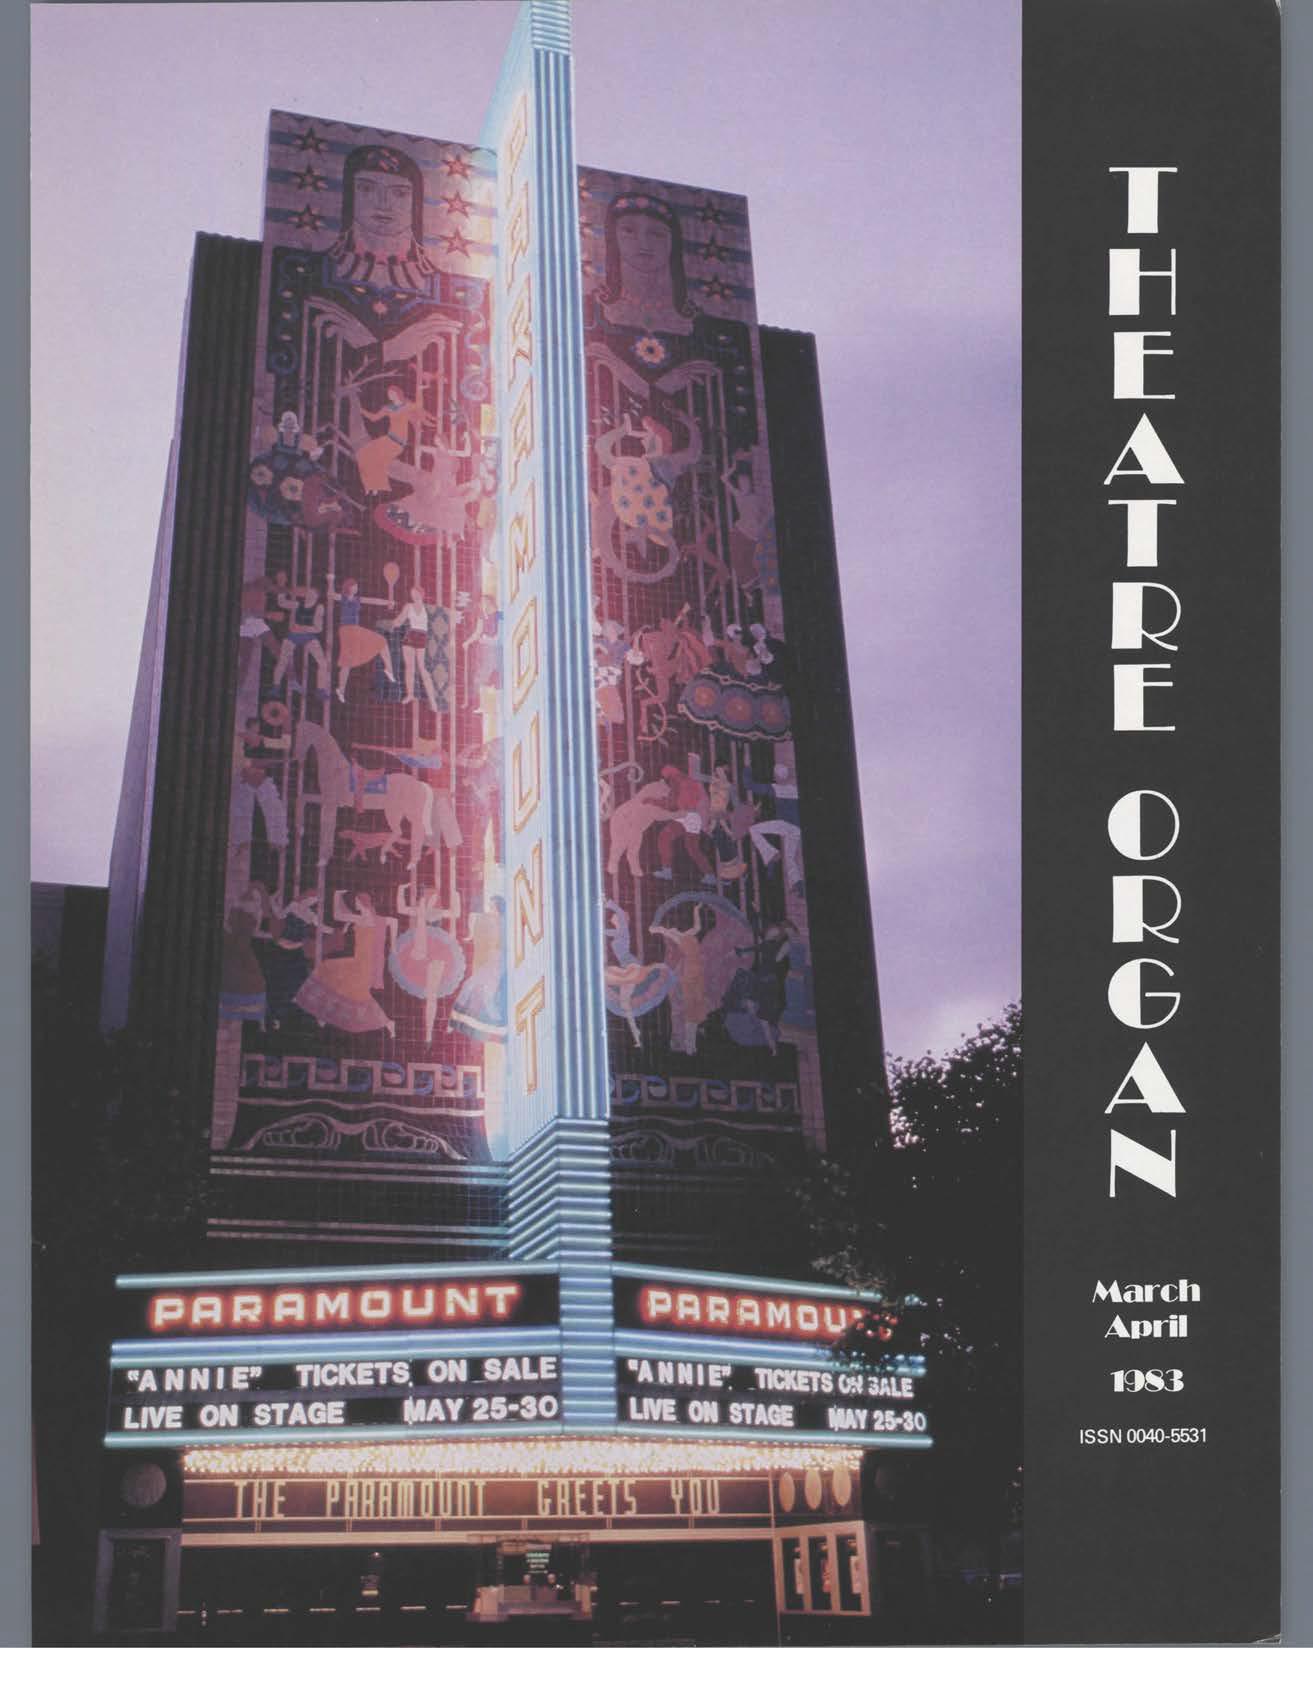 Theatre Organ, March - April 1983, Volume 25, Number 2